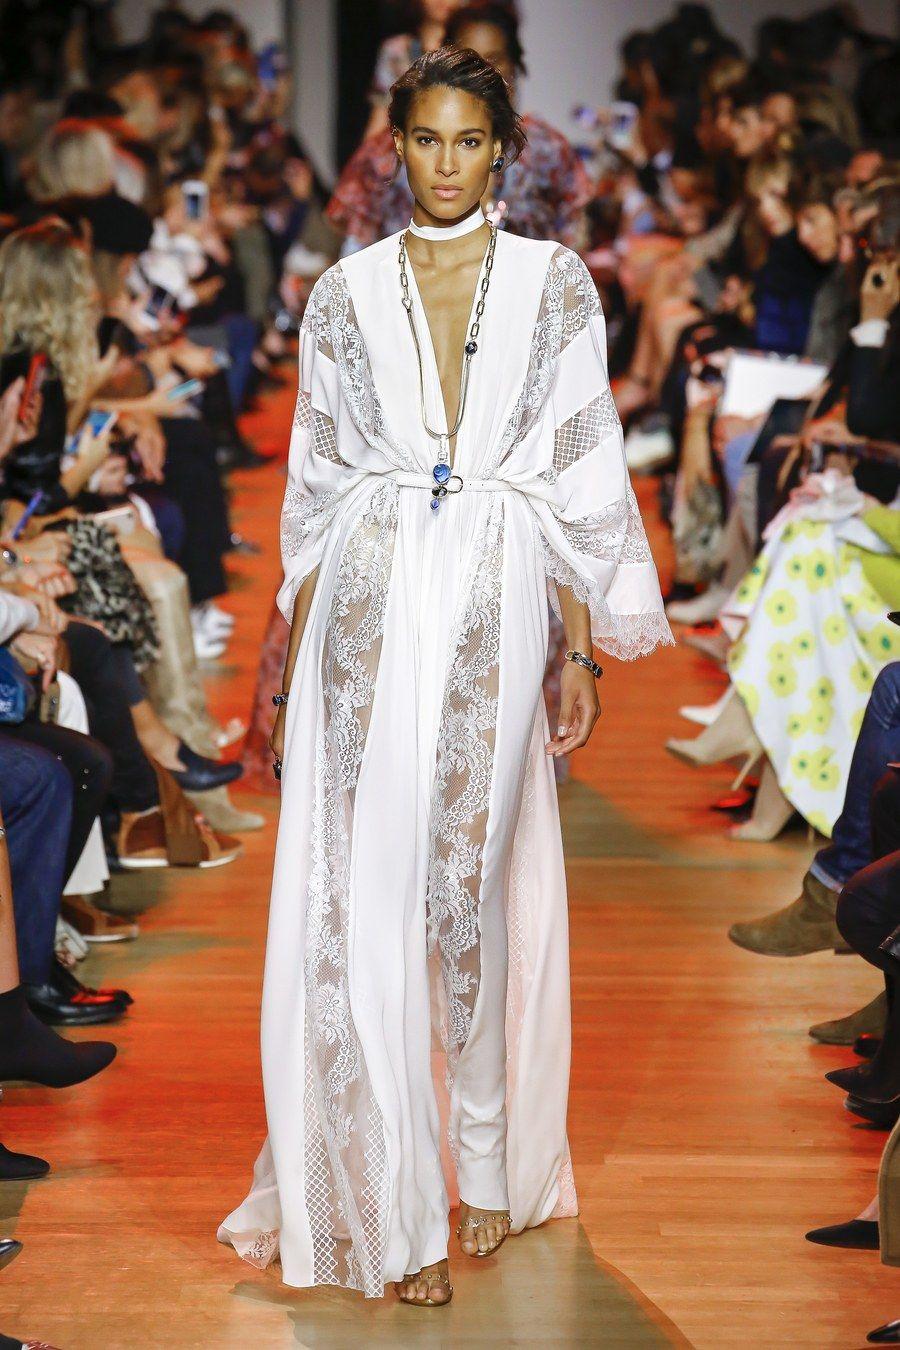 Spring 2019 Couture: 22 образа в уличном стиле. Париж, Франция, наше время картинки